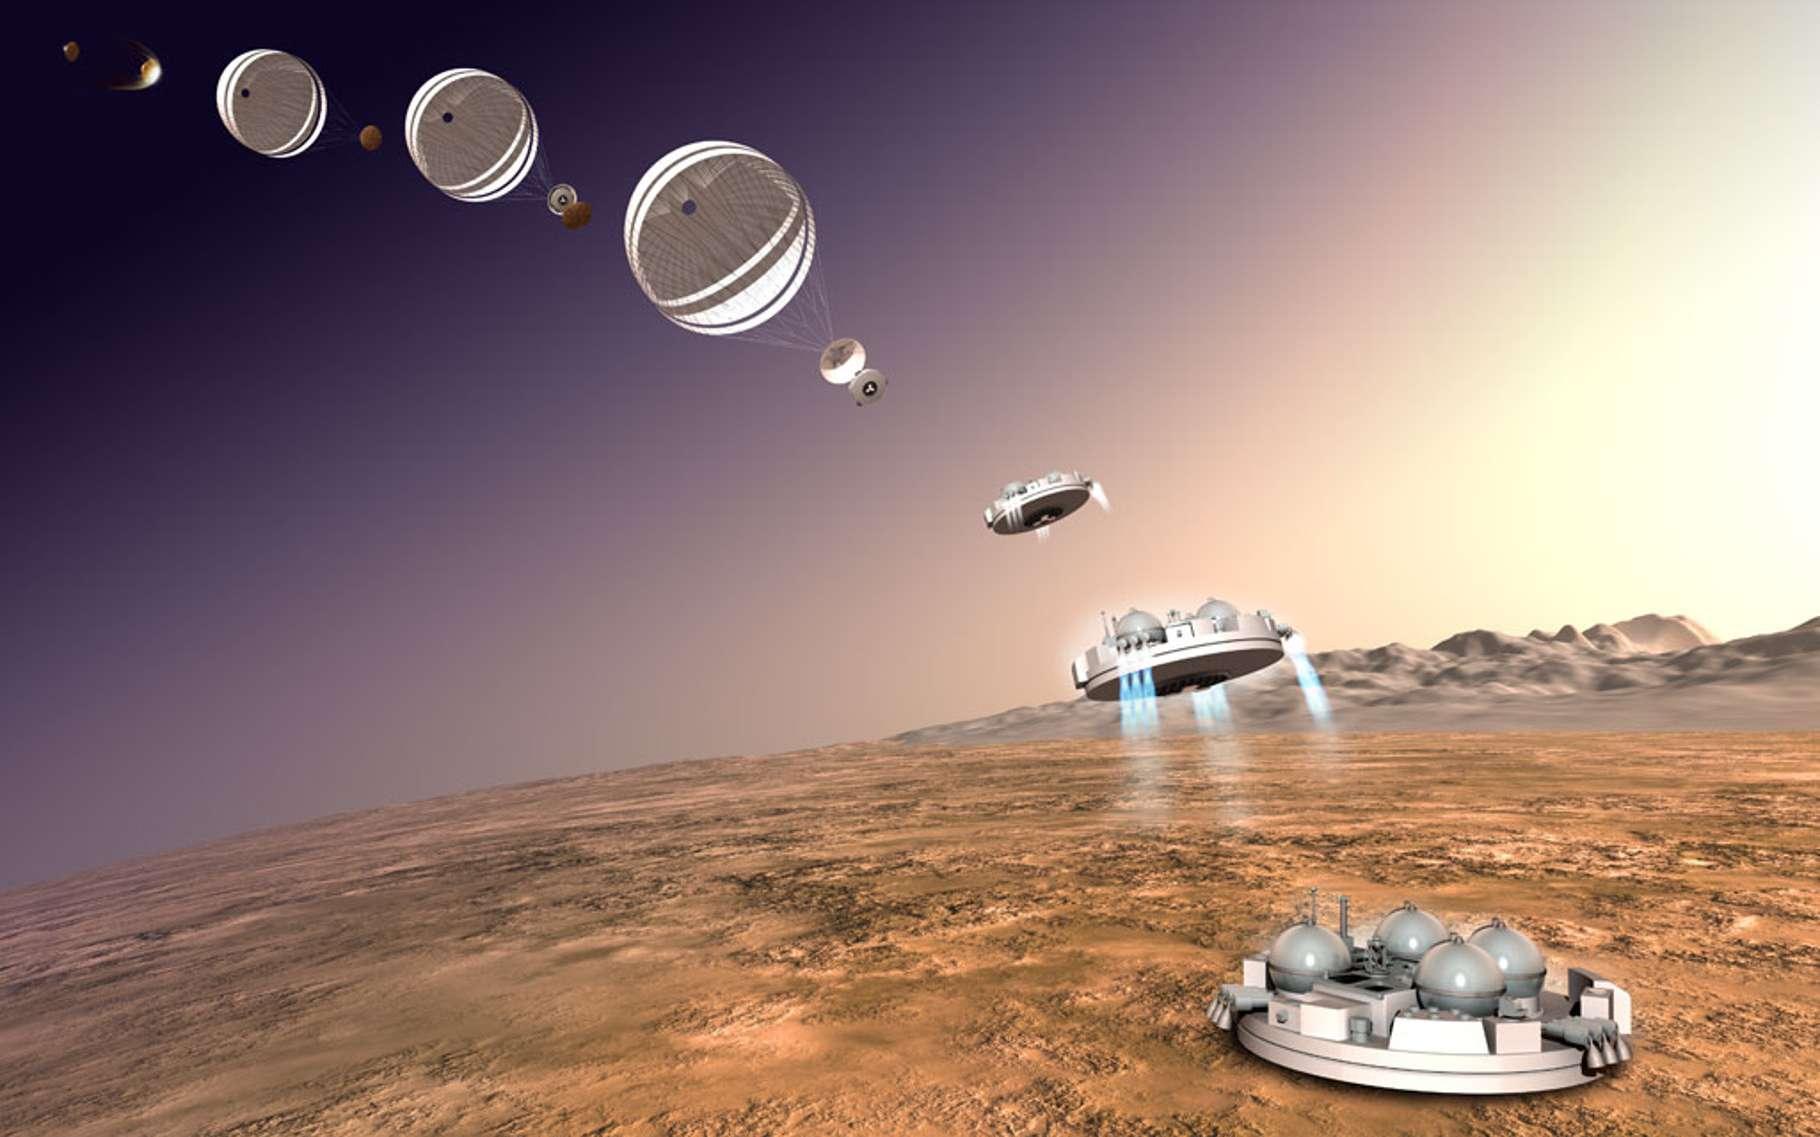 La descente de Schiaparelli sur la planète Mars aura lieu ce mercredi 19 octobre 2016. © ESA